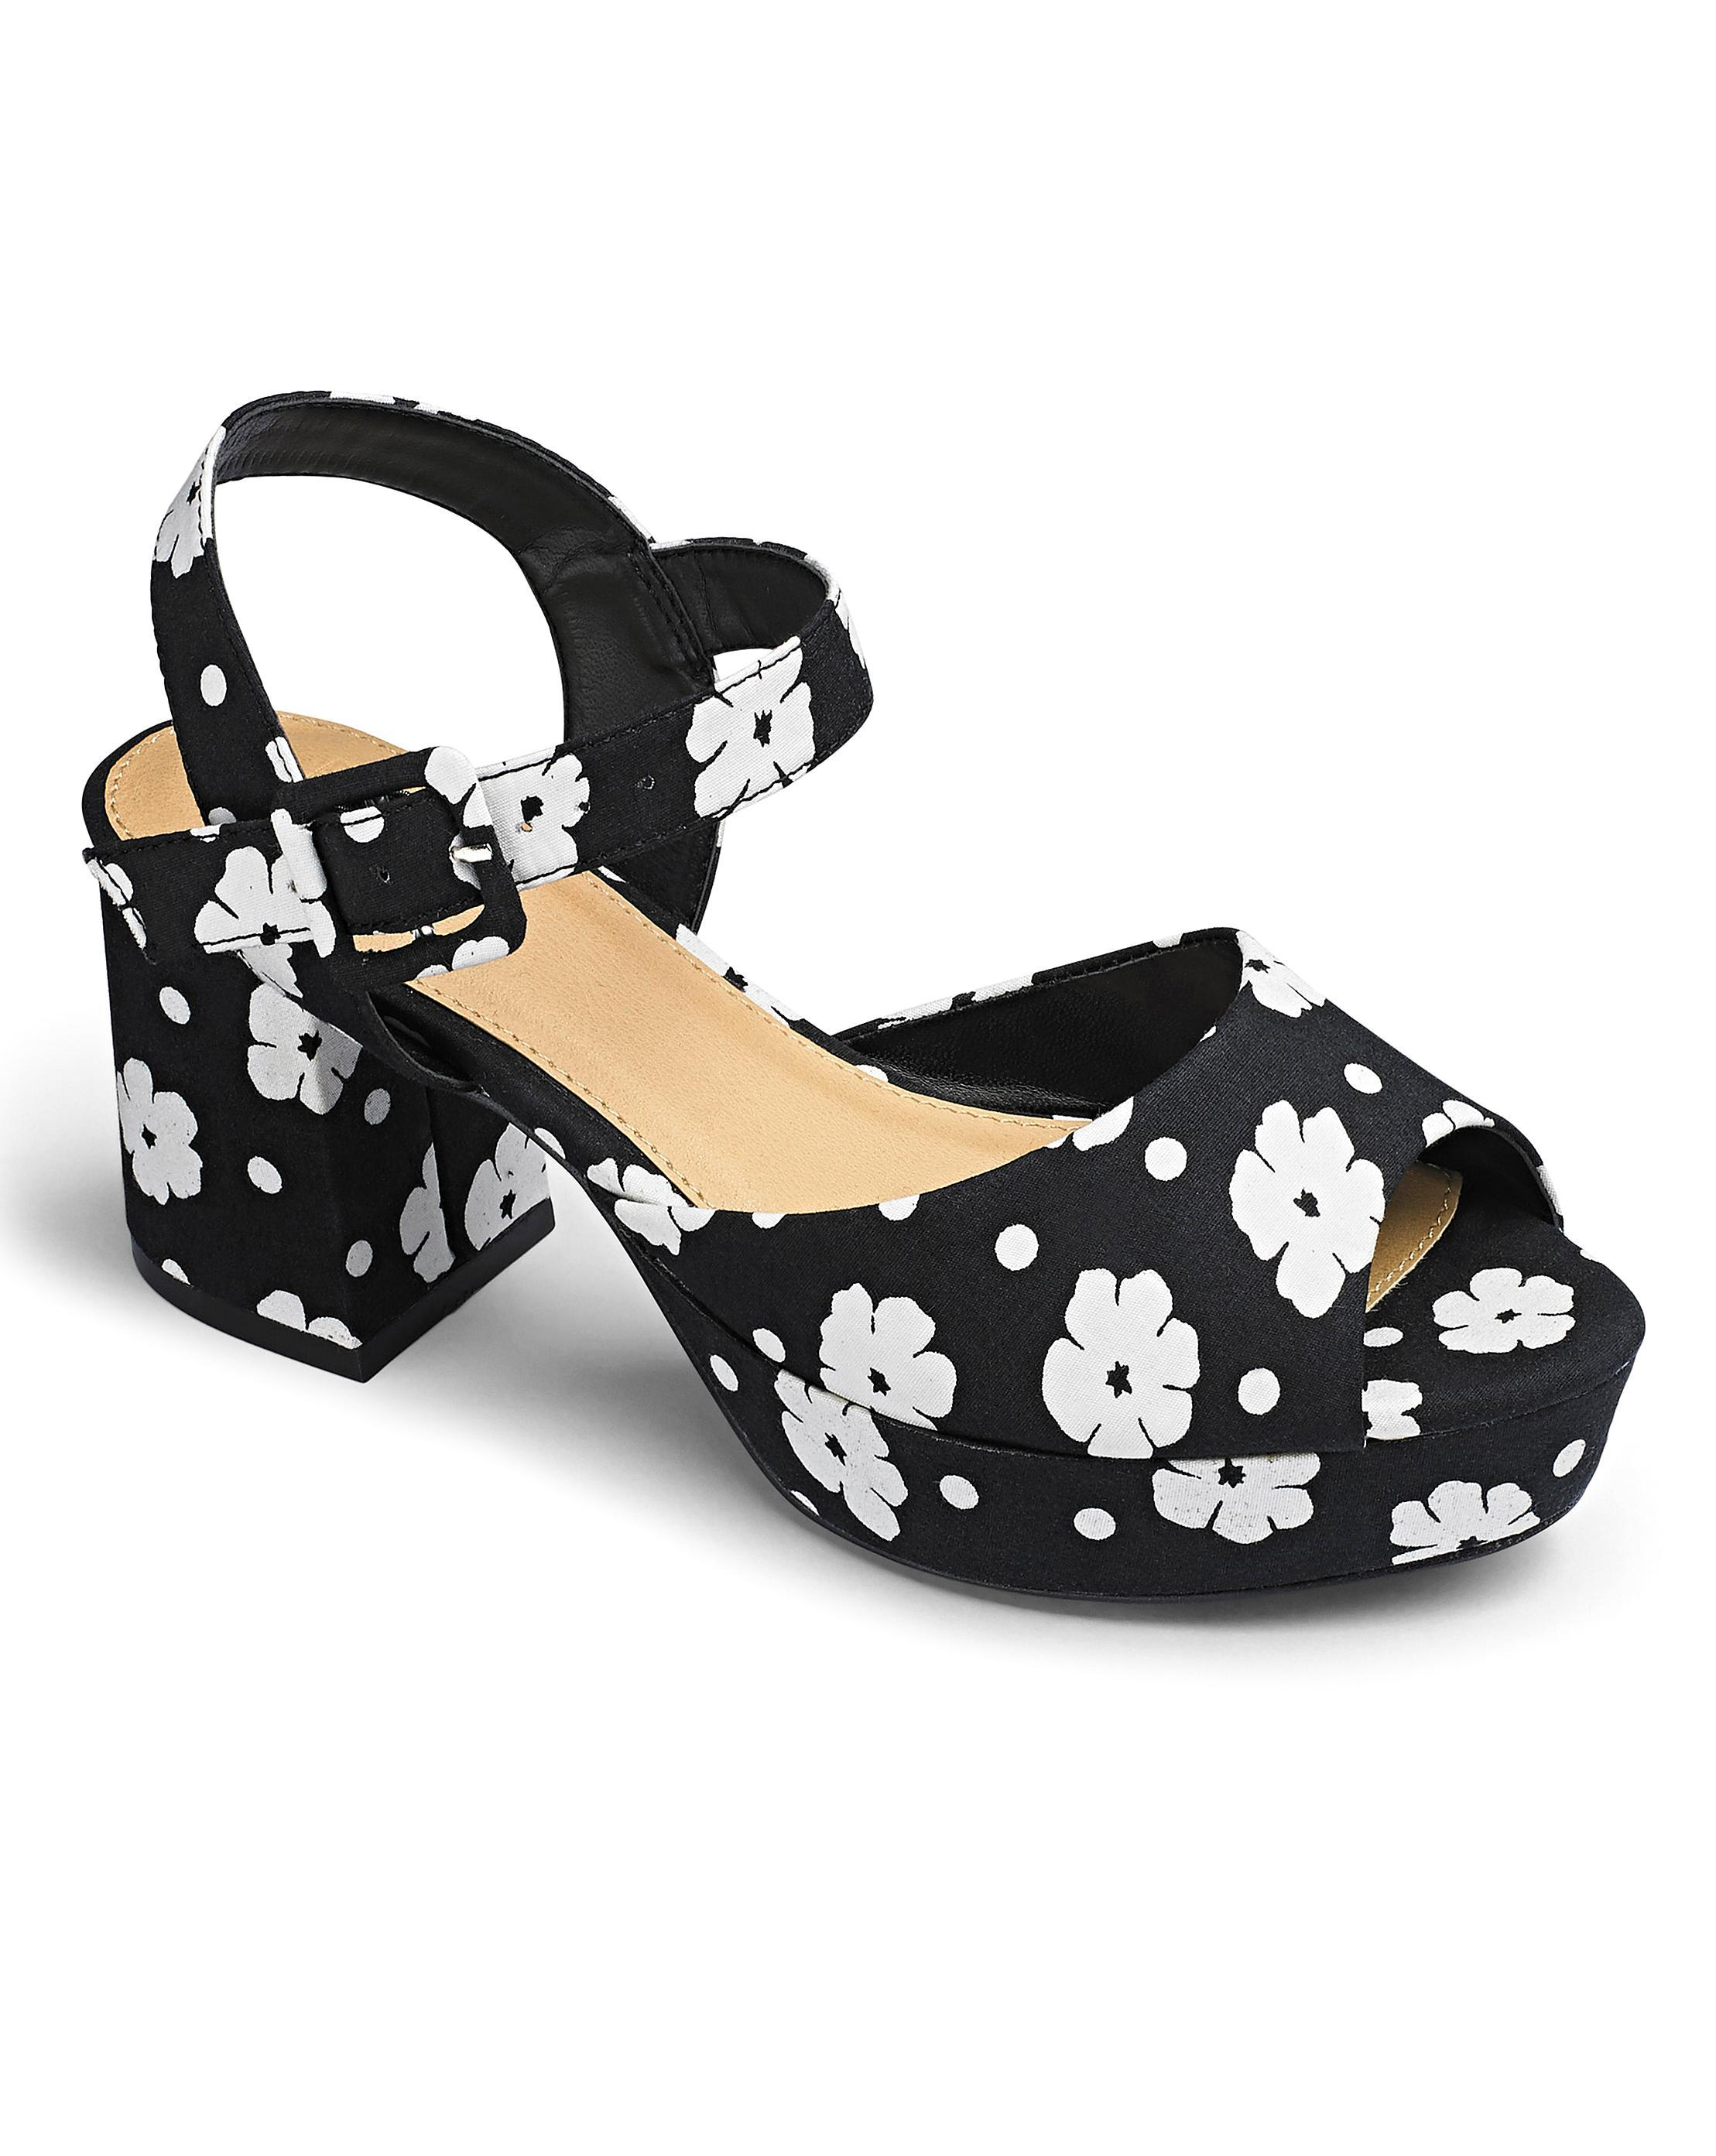 c4ff09ce6 Lyst - Simply Be Sole Diva Block Heel Sandals in Black